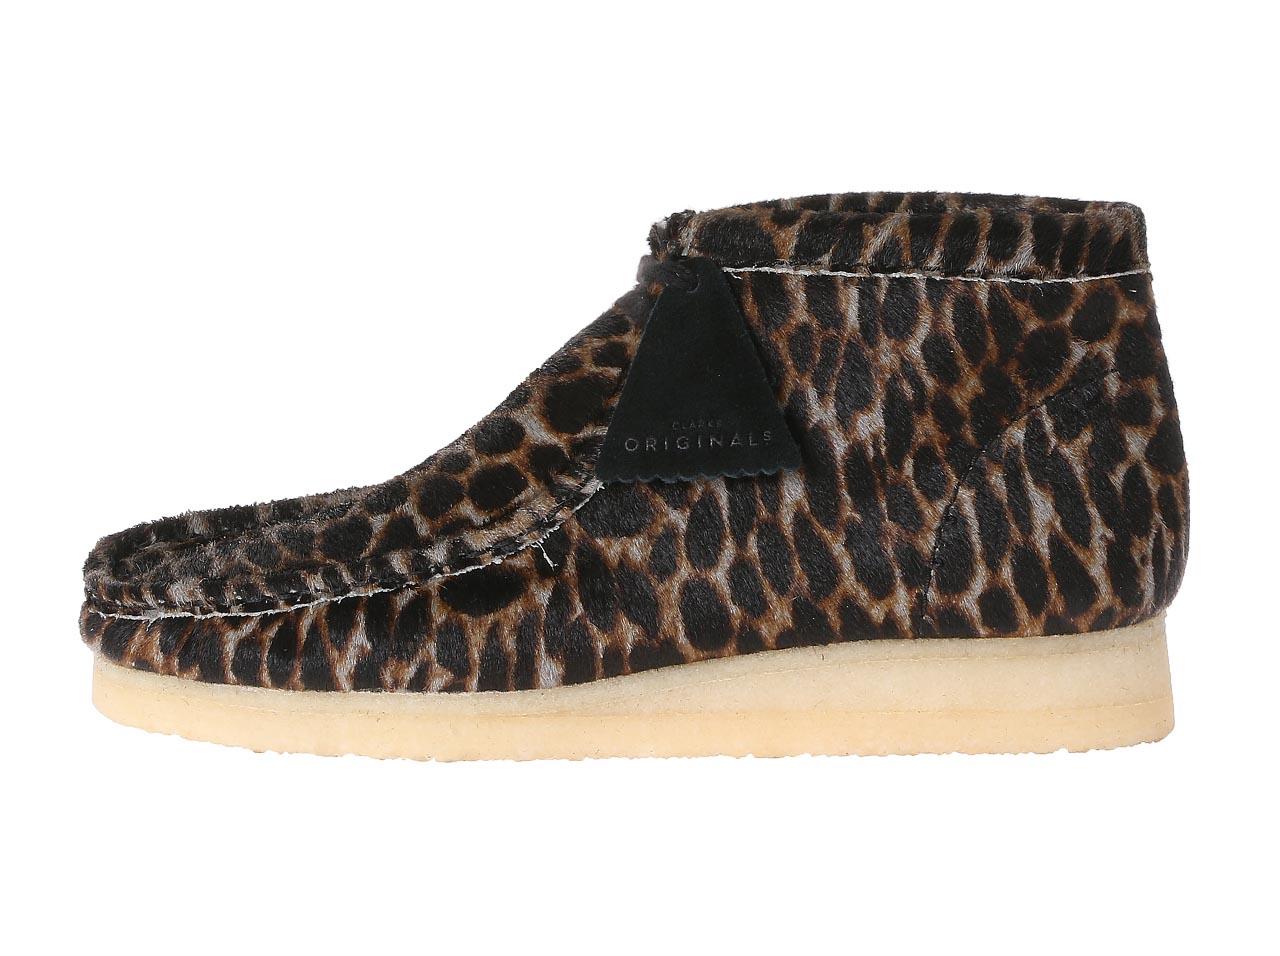 【OUTLET特価】CLARKS Wallabee Boot(26146759)【クラークス】【シューズ】【ブーツ】【靴】【フットウェア】